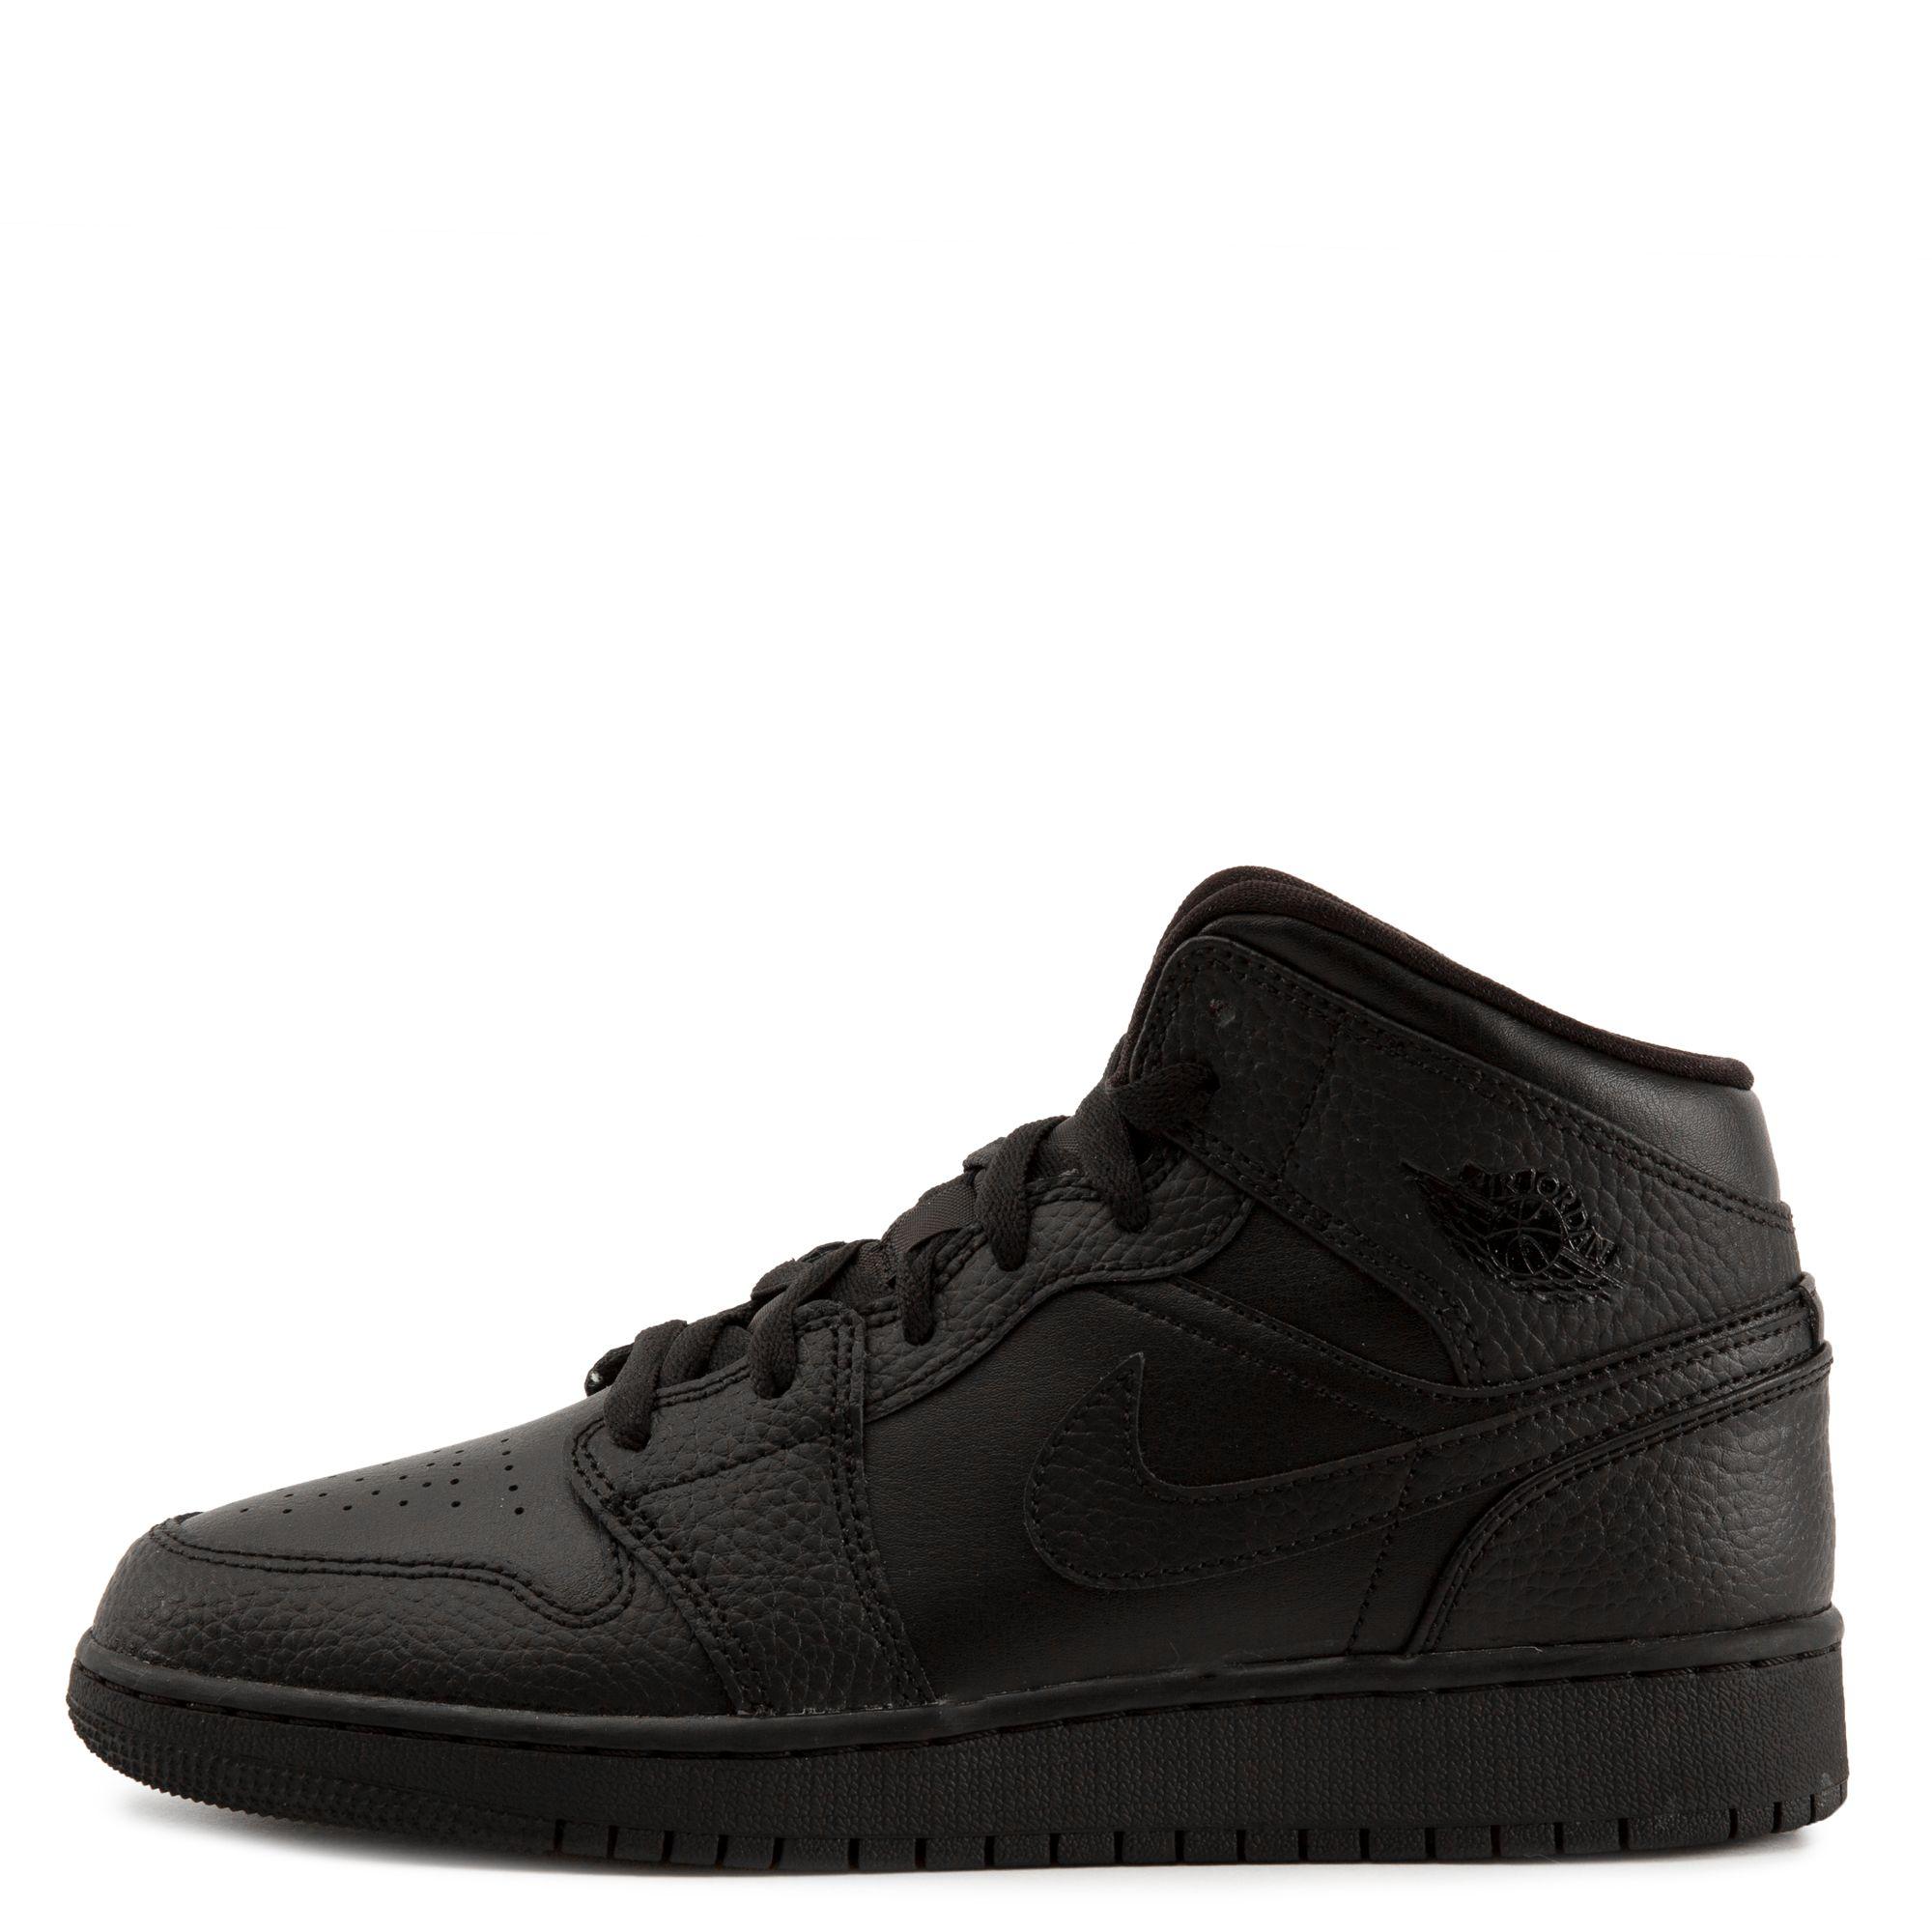 GS) Air Jordan 1 Mid Black/Black-Black